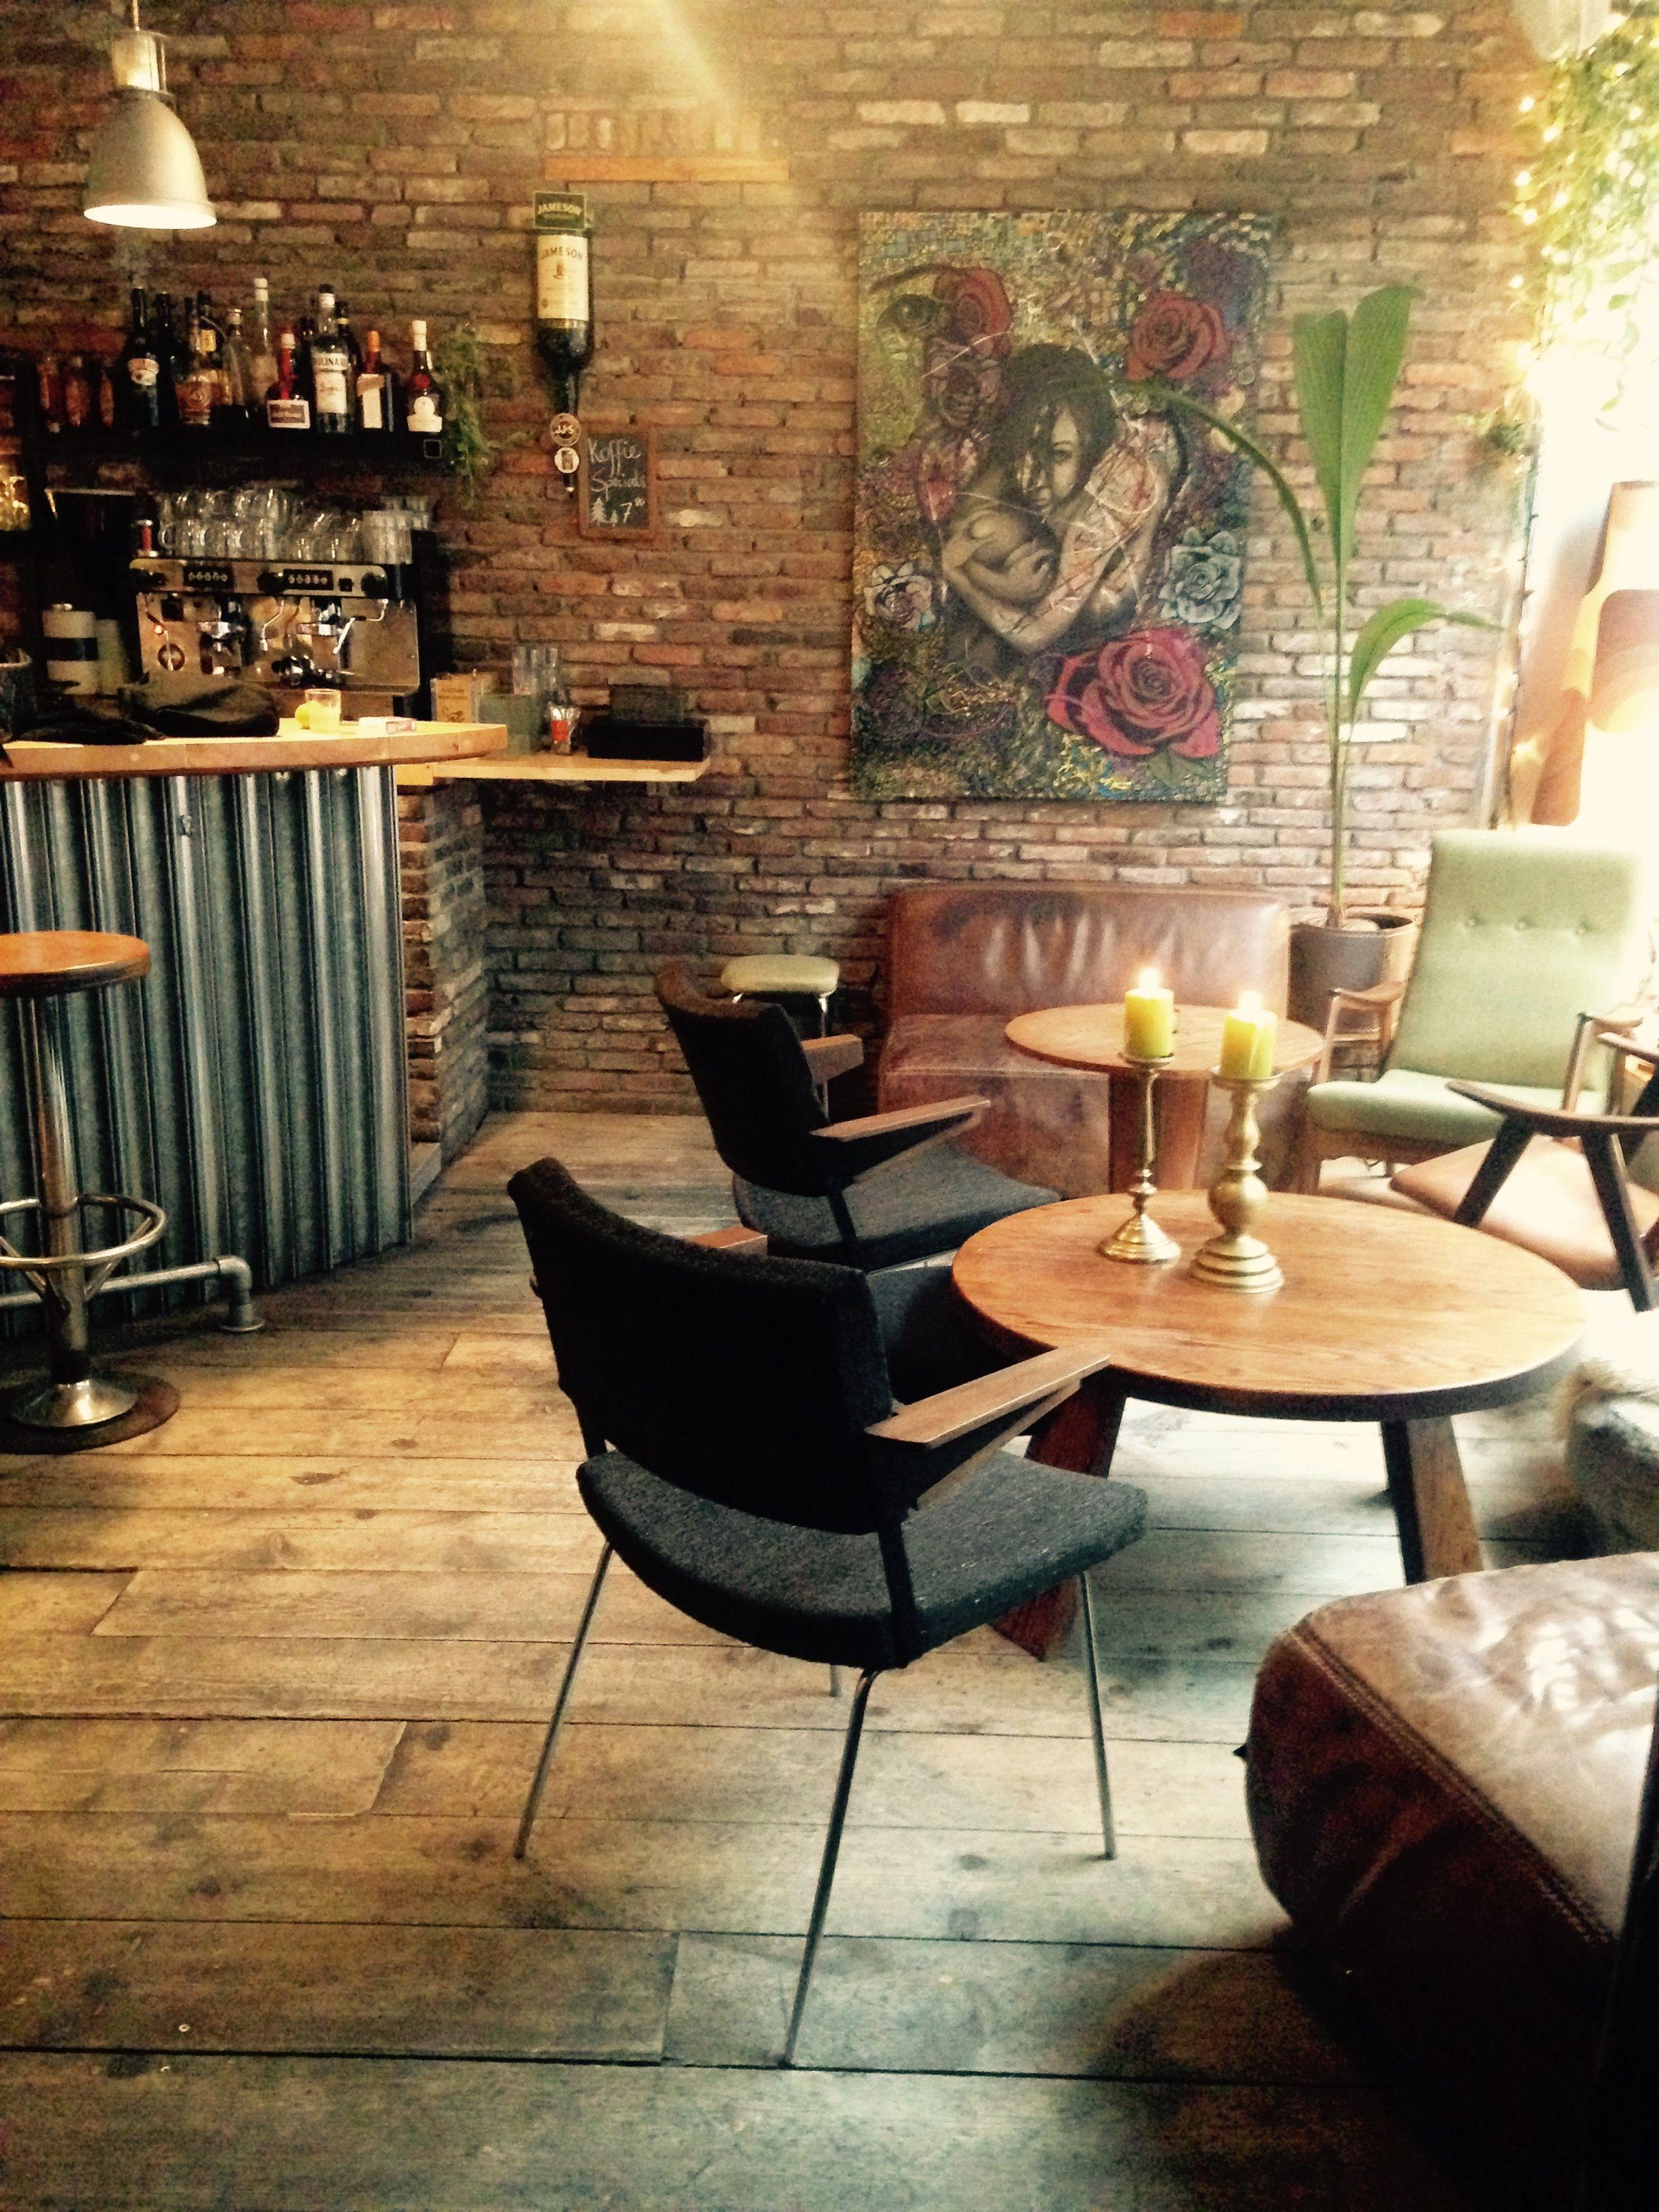 Pin Van Kailee Marie Op Cafe Labru Rotterdam Eten